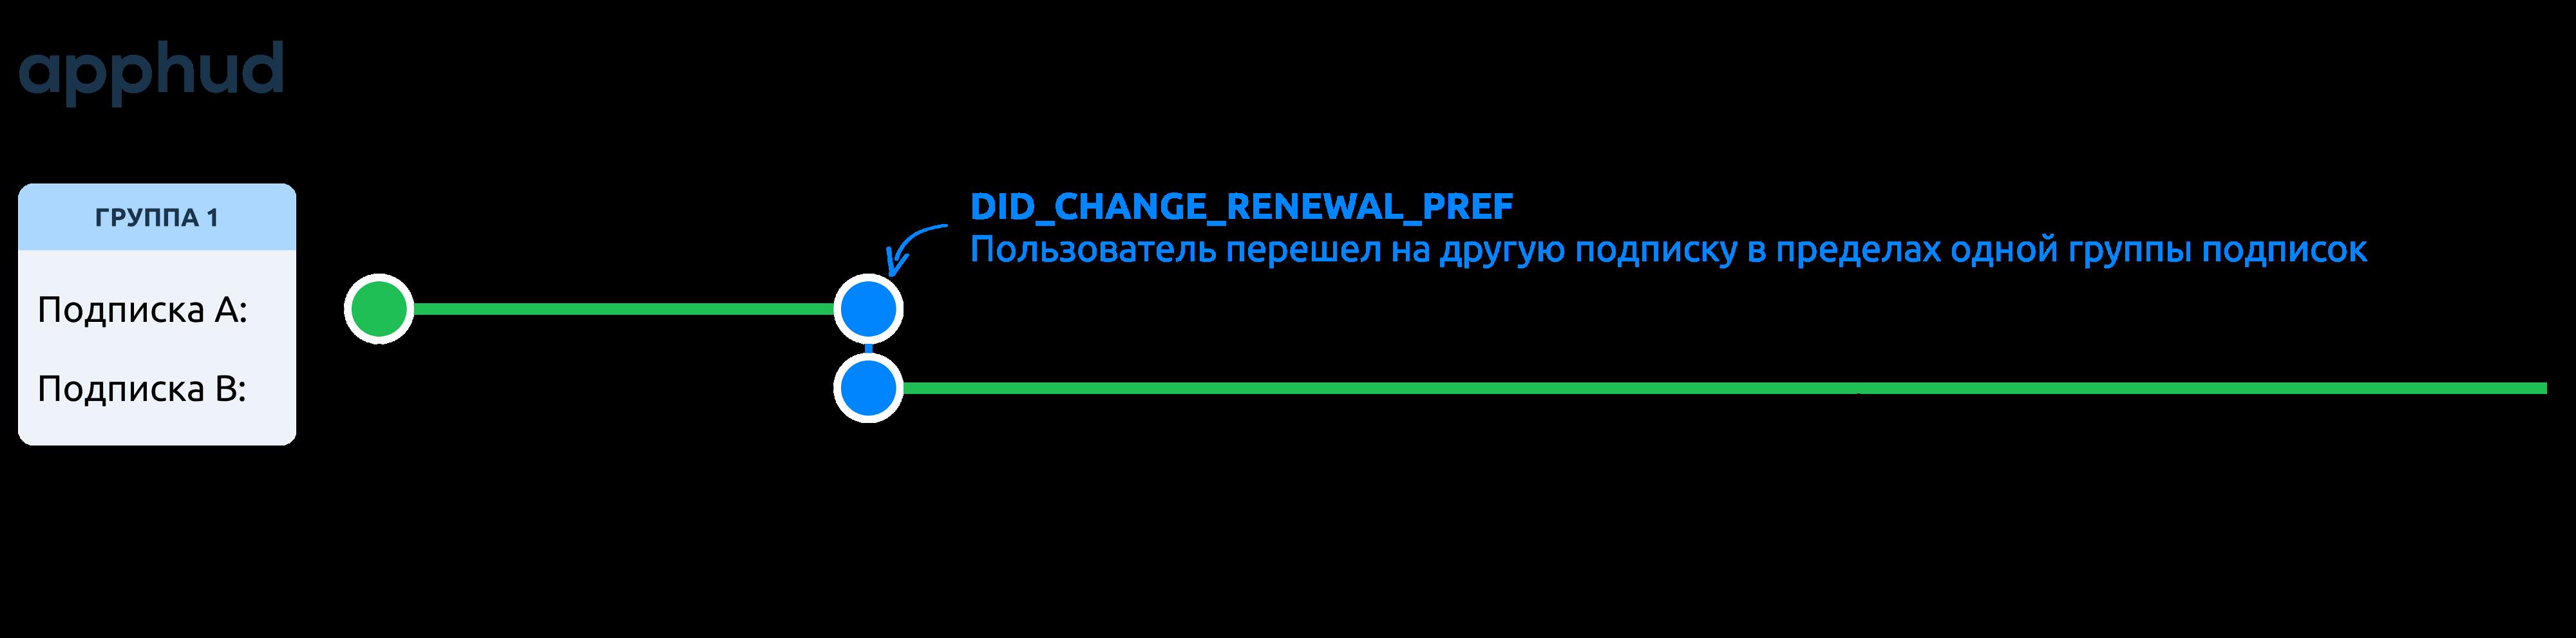 Событие DID_CHANGE_RENEWAL_PREF